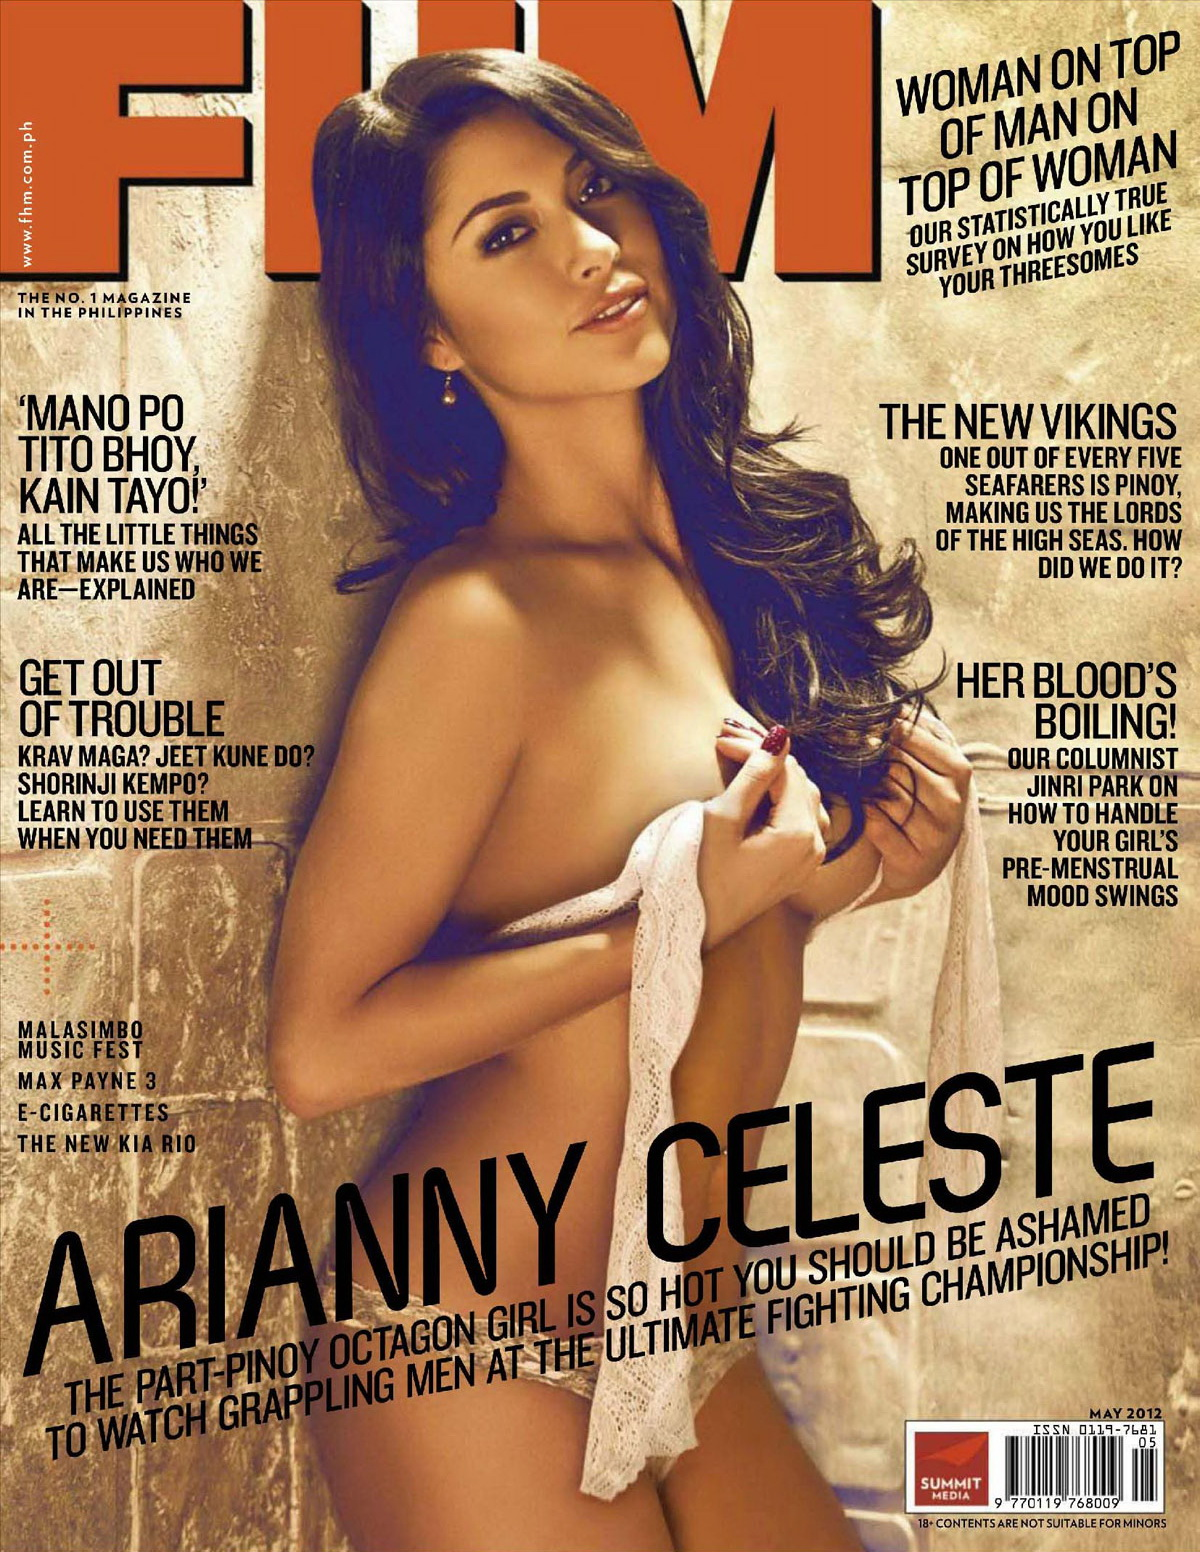 http://1.bp.blogspot.com/-NwzFQ7EV6Bc/T6KdXTIBn0I/AAAAAAAAD3I/92Gd4UYLjcA/s1600/ARIANNY-CELESTE-FHM-Magzine-May-2012-Issue-Philippines-01.jpg